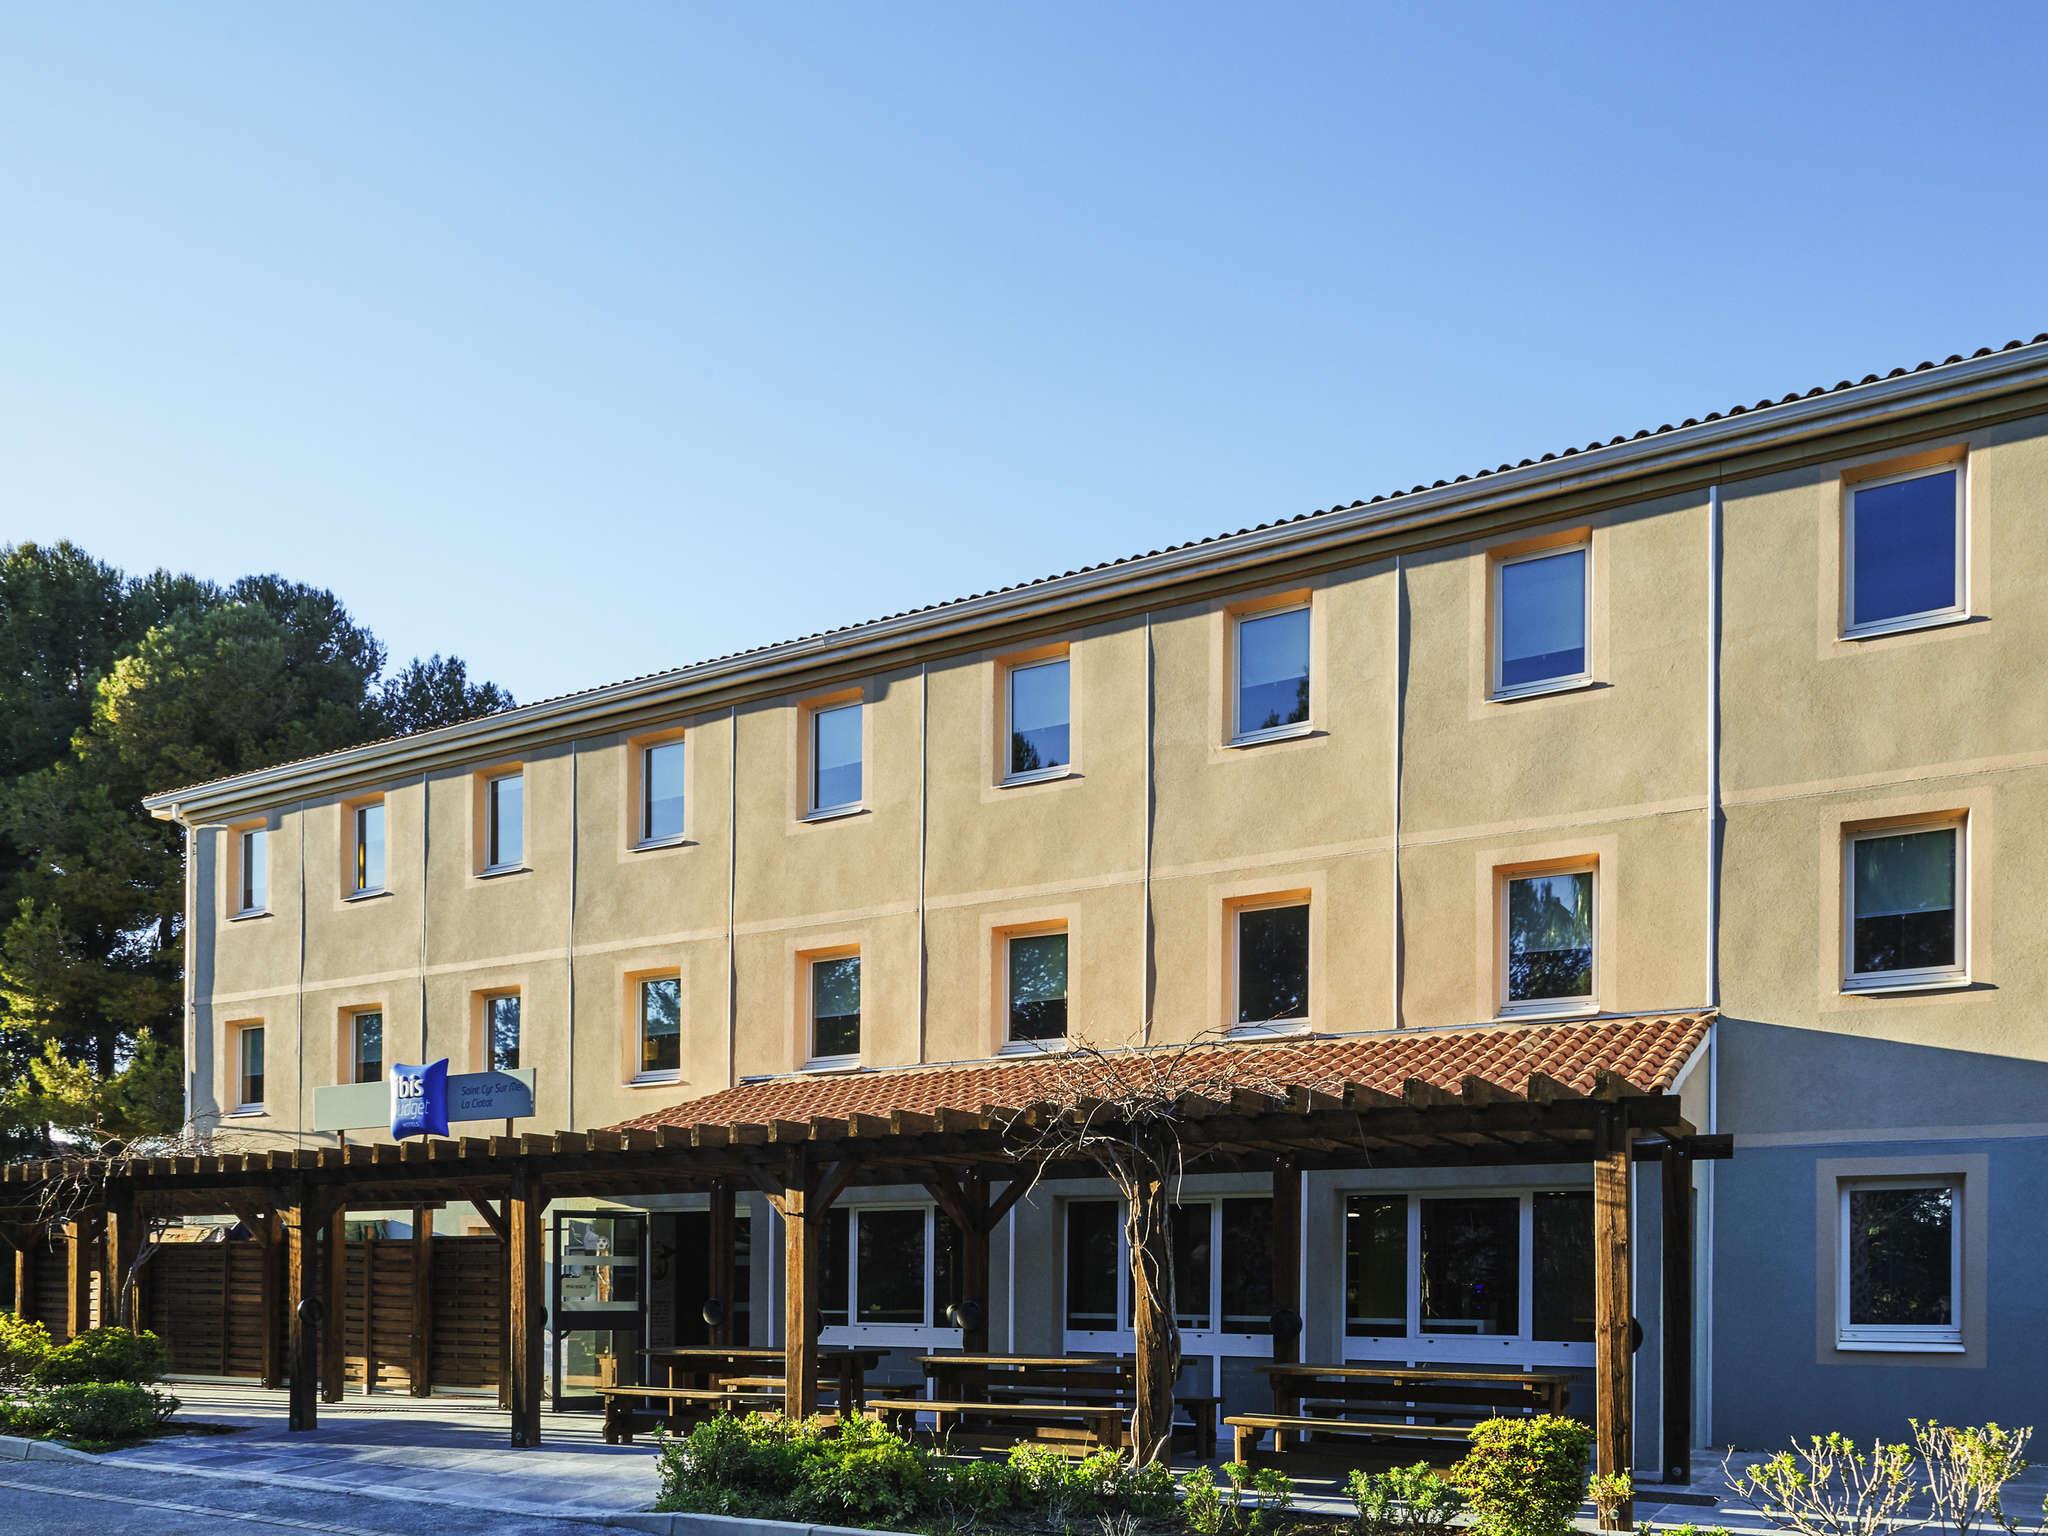 Hotel – ibis budget Saint-Cyr-sur-Mer La Ciotat